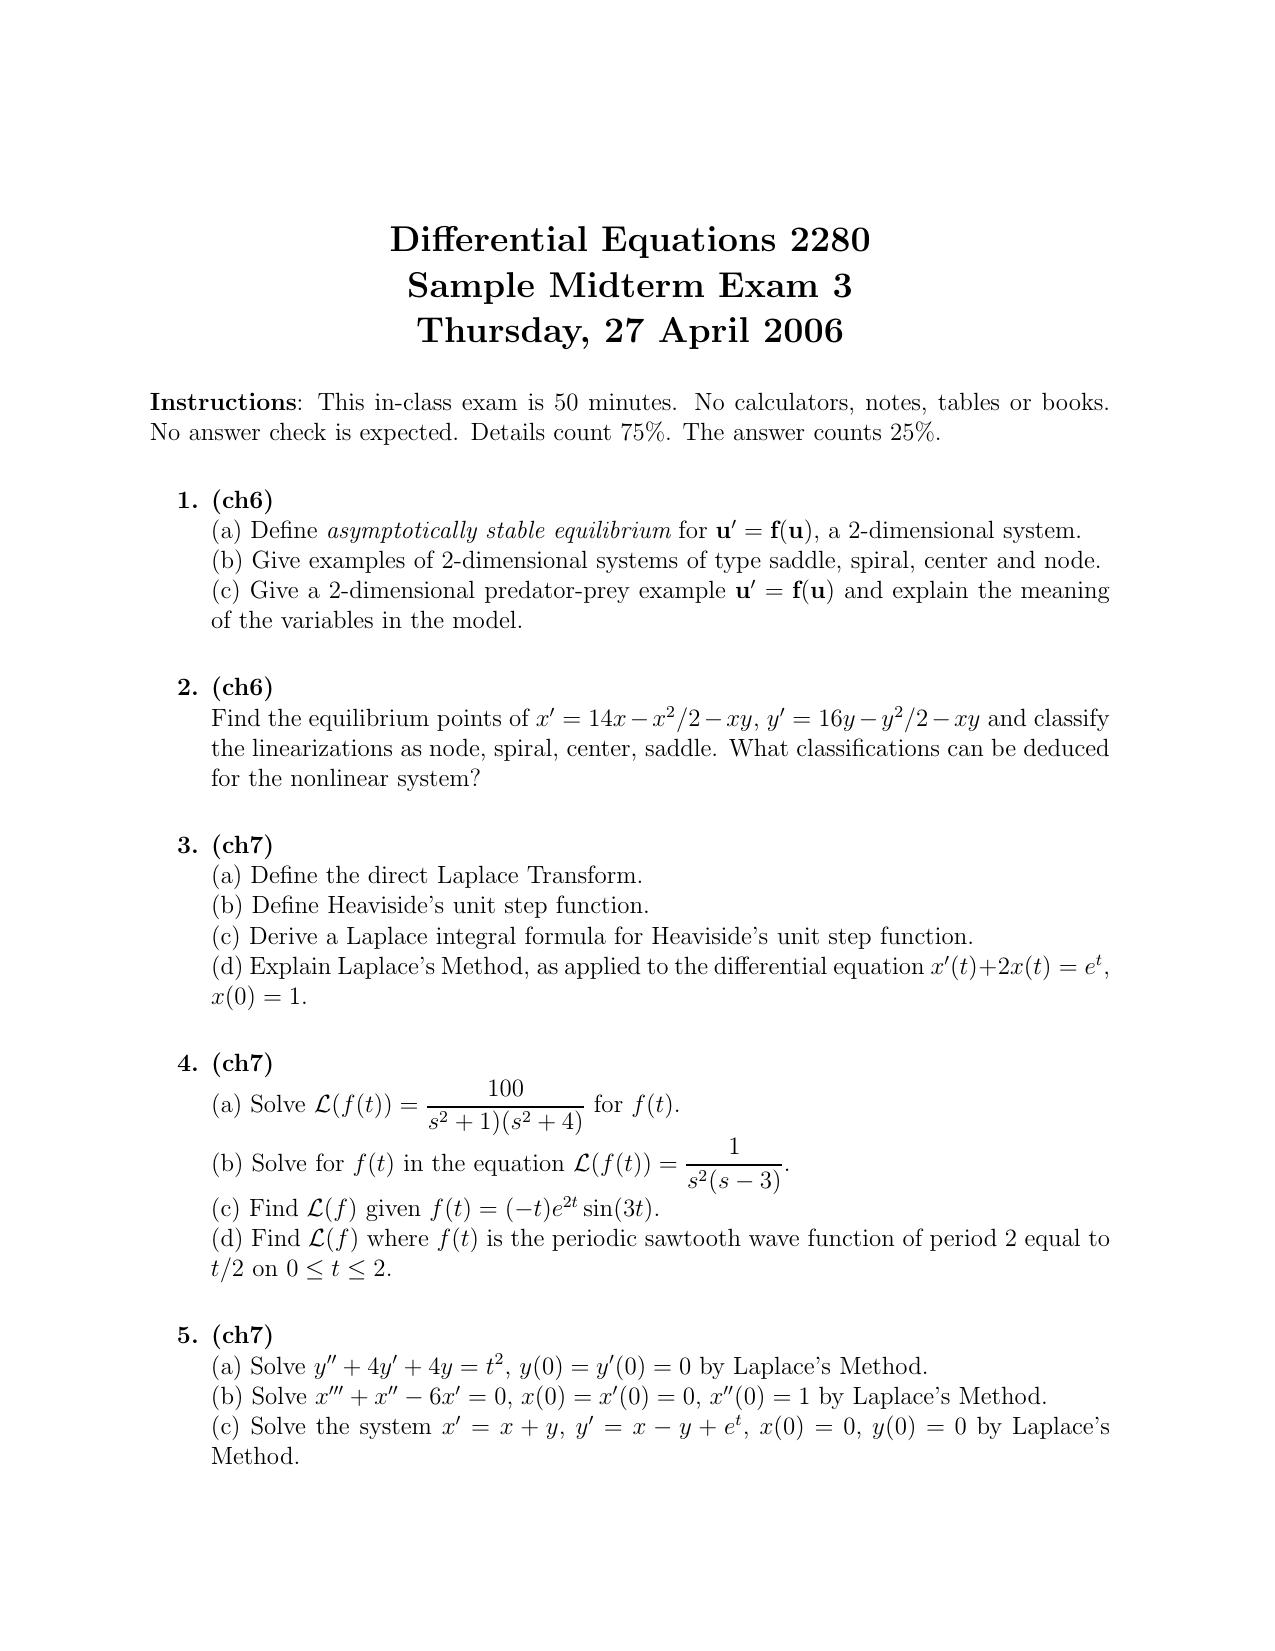 Differential Equations 2280 Sample Midterm Exam 3 Thursday, 27 April